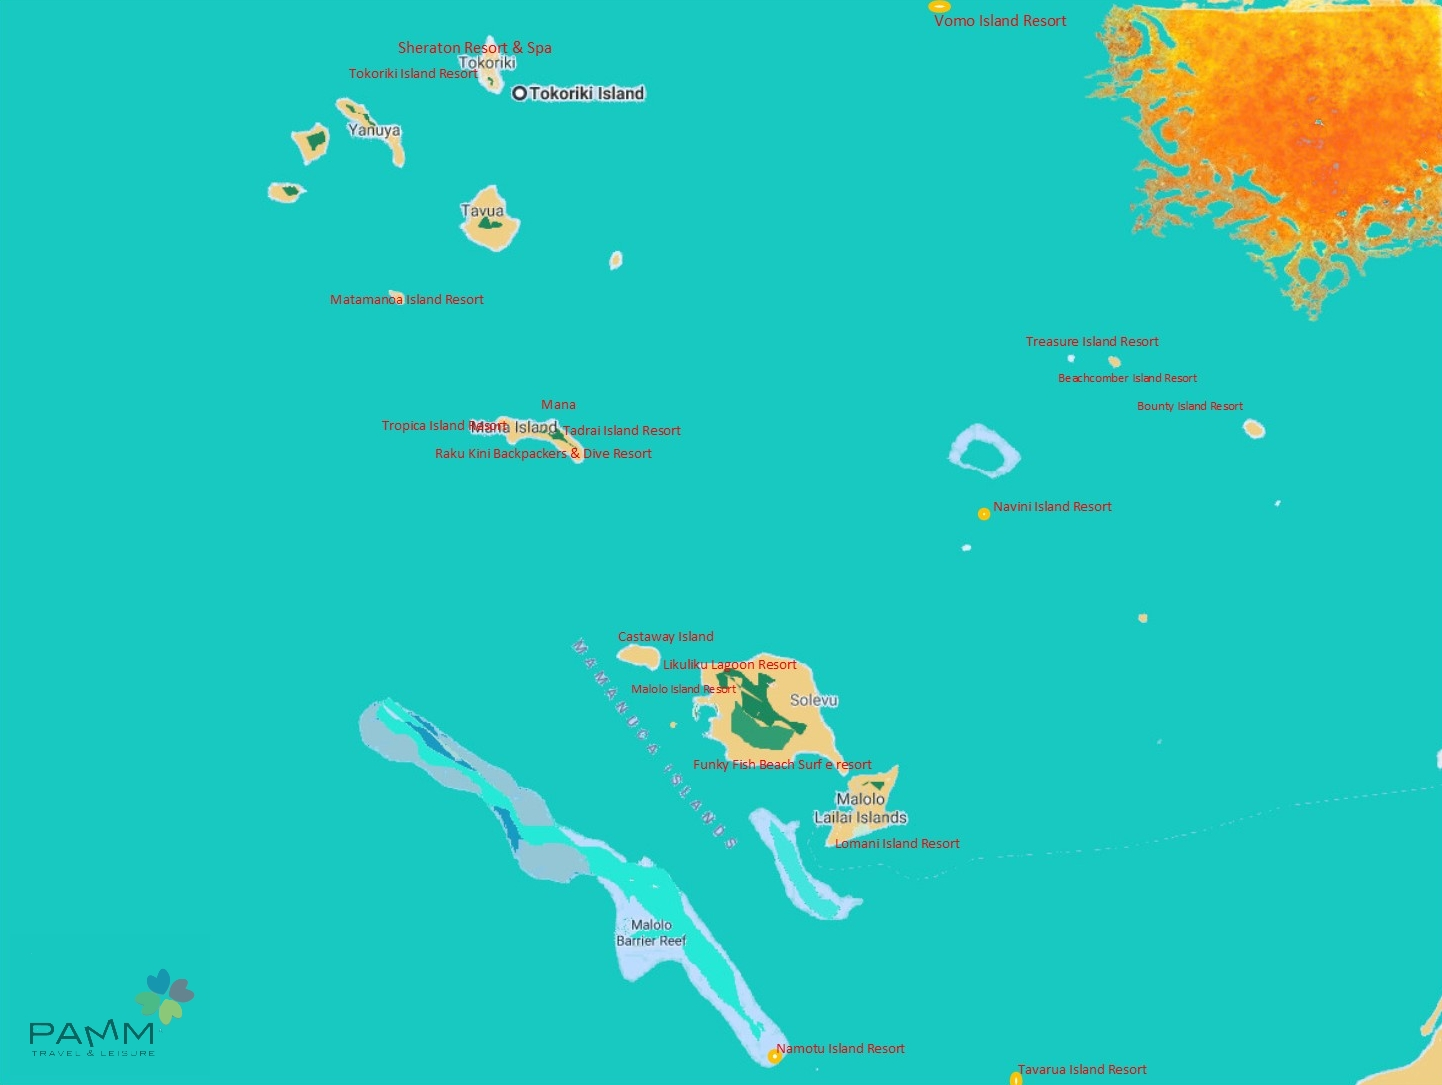 Fiji Mamanuca Resort e Isole